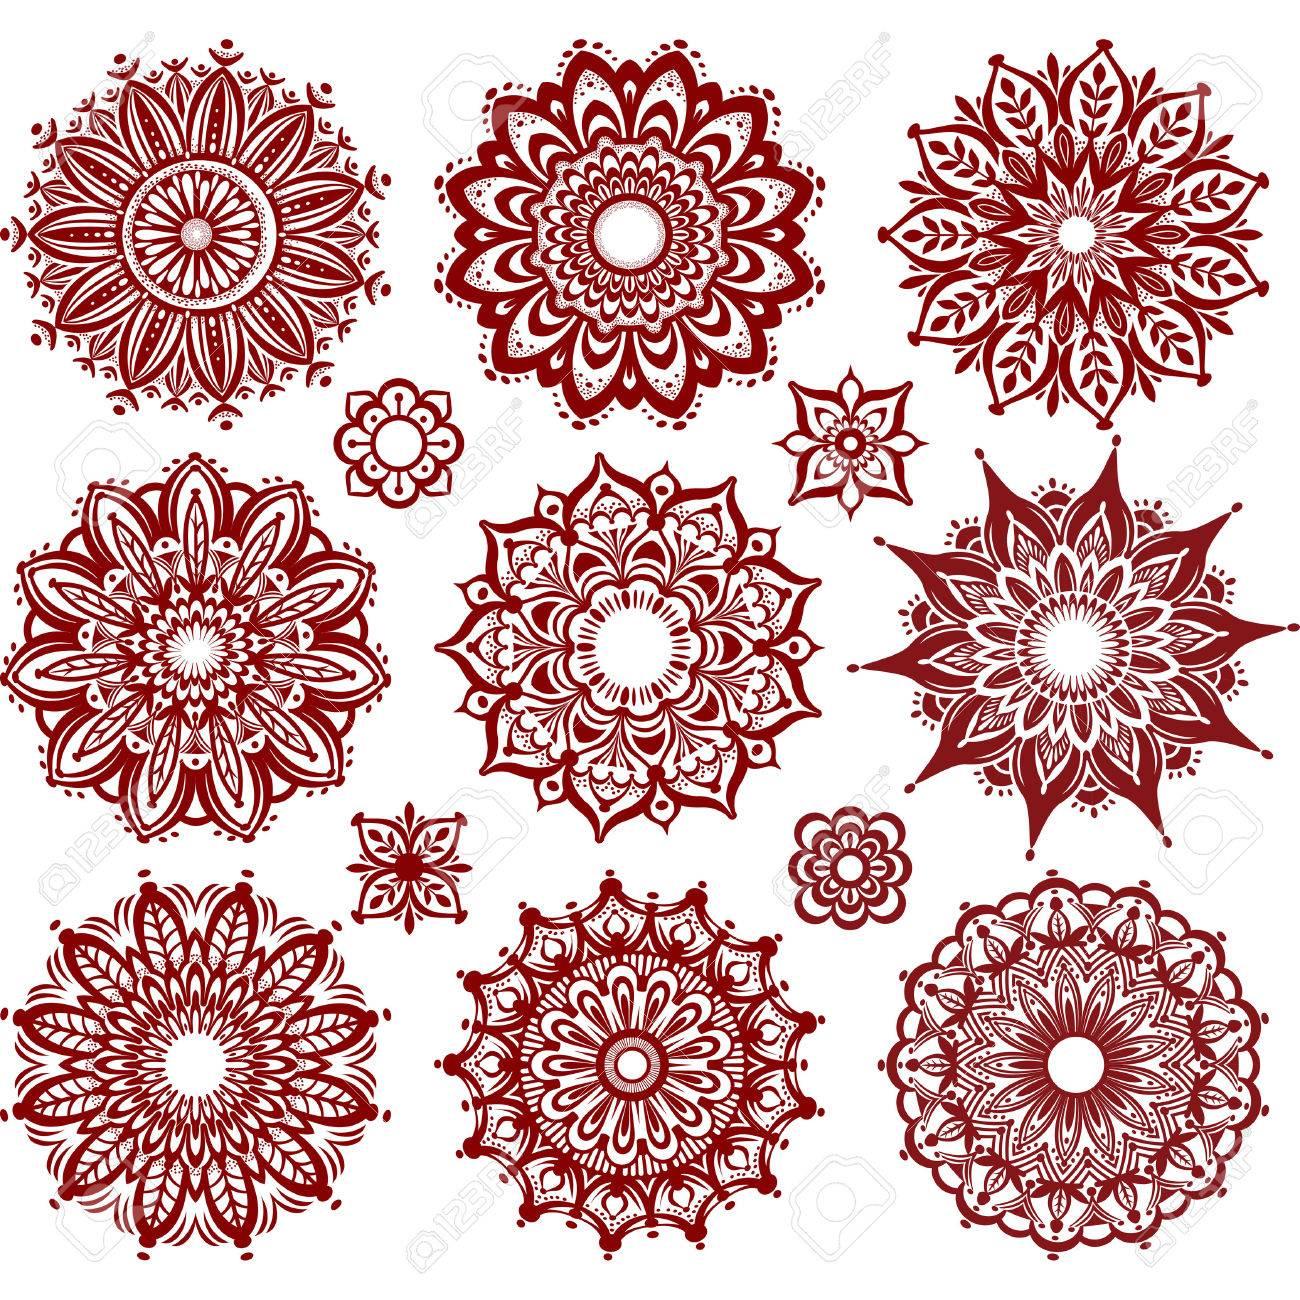 Set of Round Ornament Patterns - 41610732